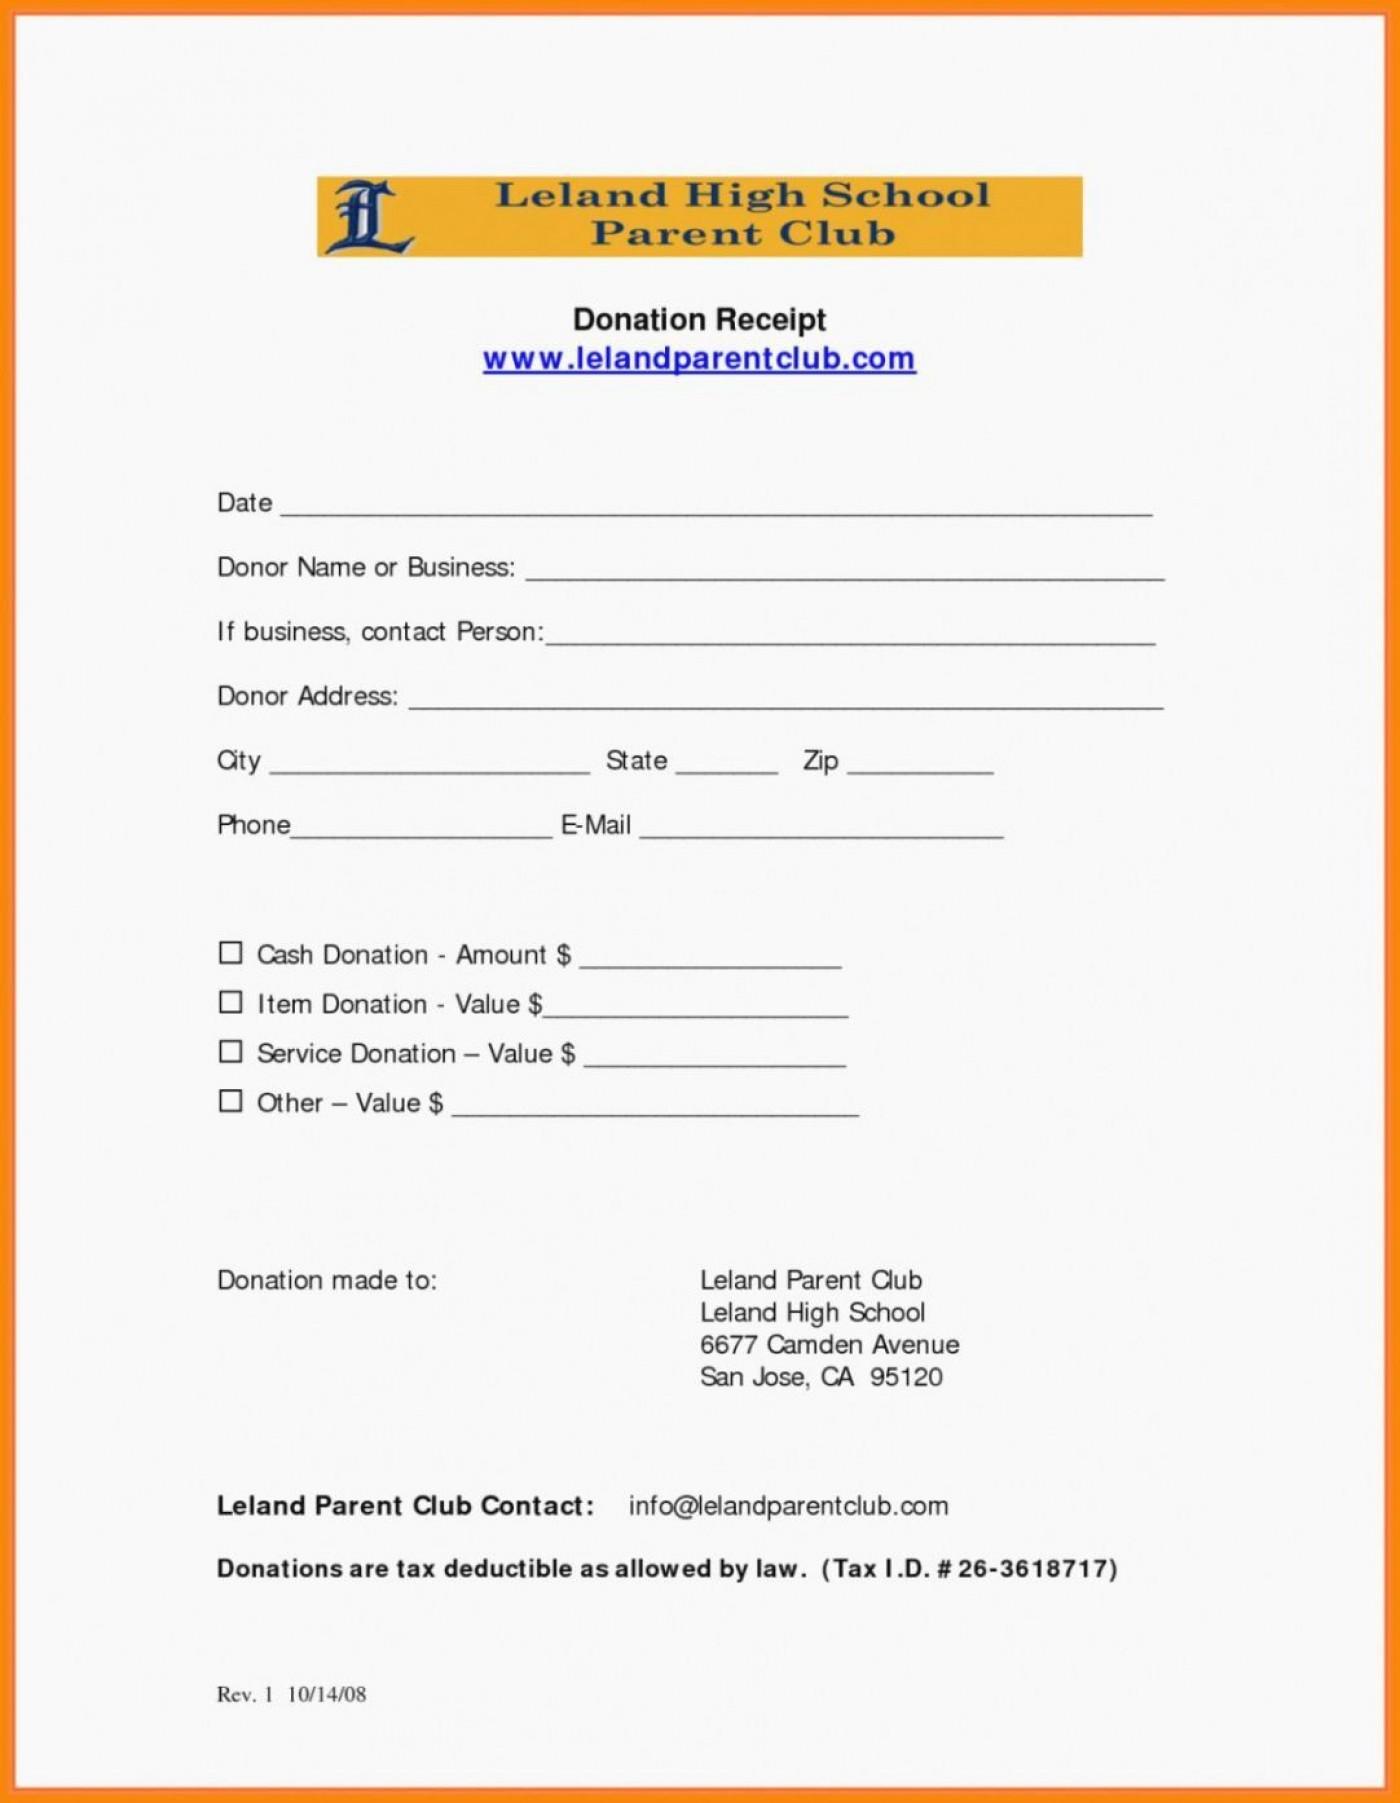 002 Staggering Tax Deductible Donation Receipt Template Australia Picture 1400